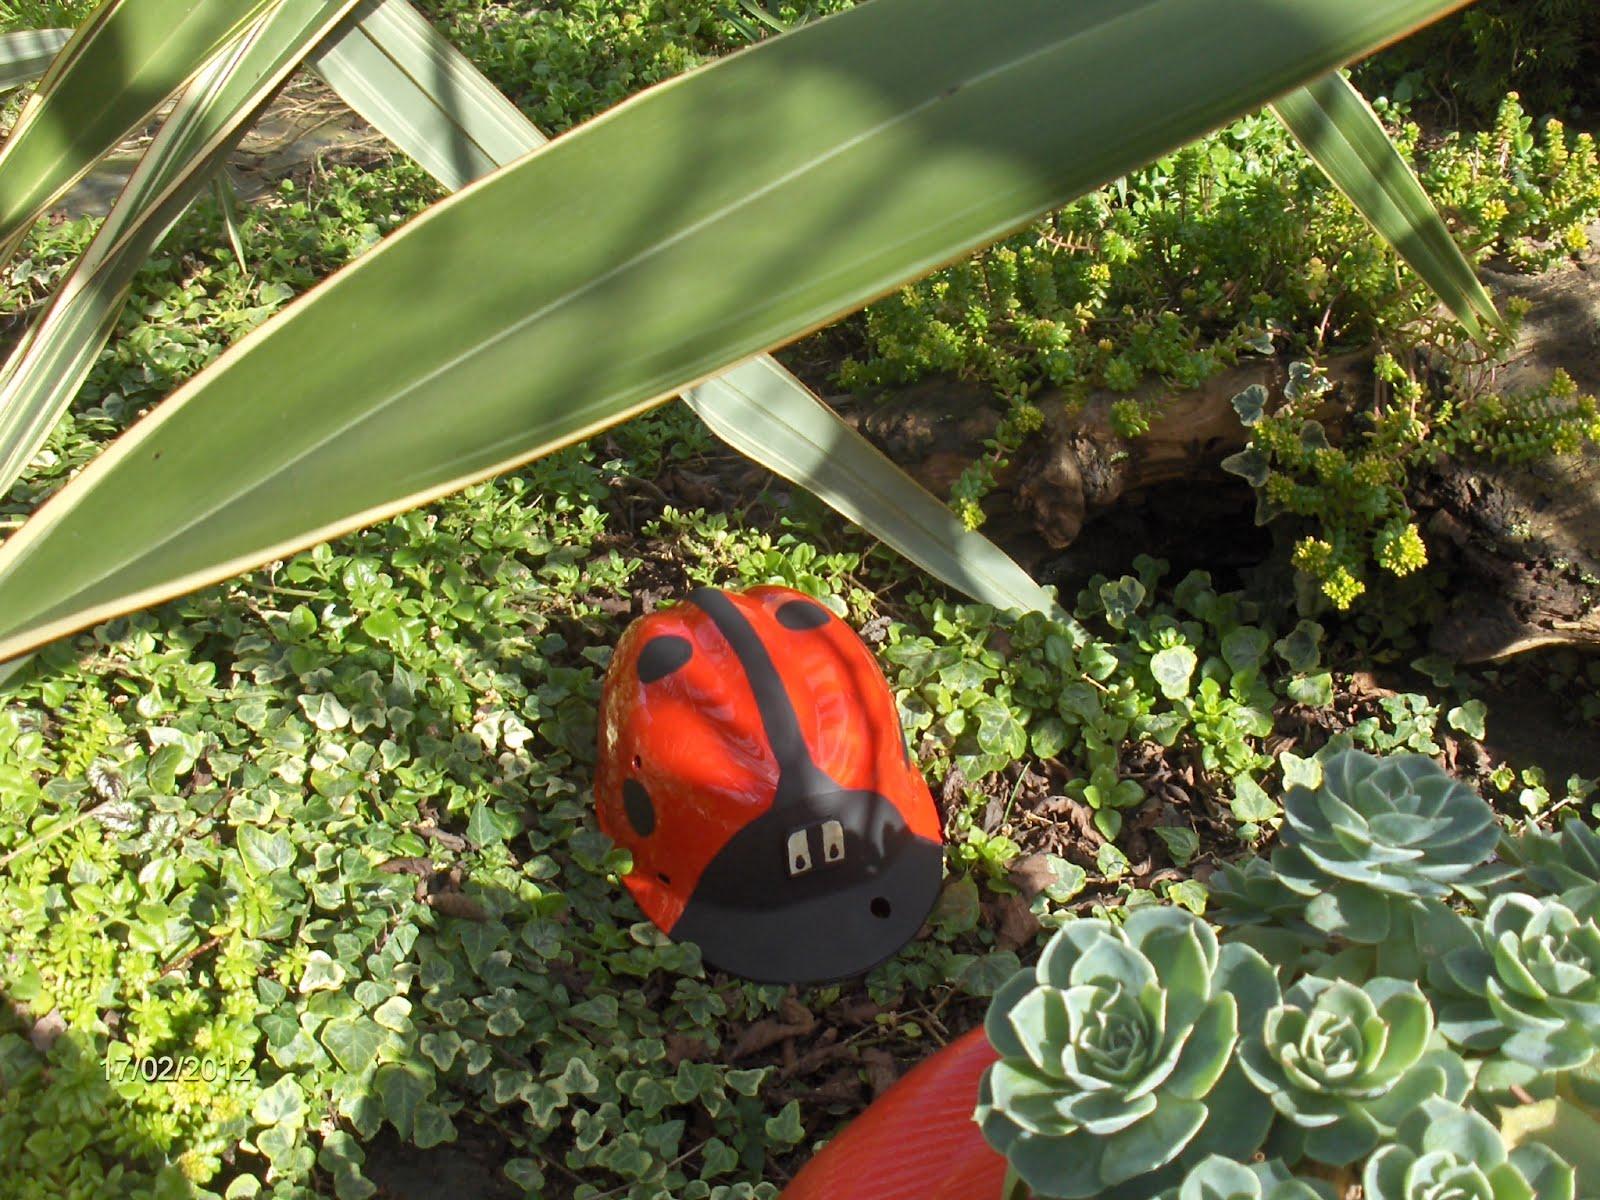 Aprendiz reciclar casco de obra para convertirlo en for Reciclaje para jardin